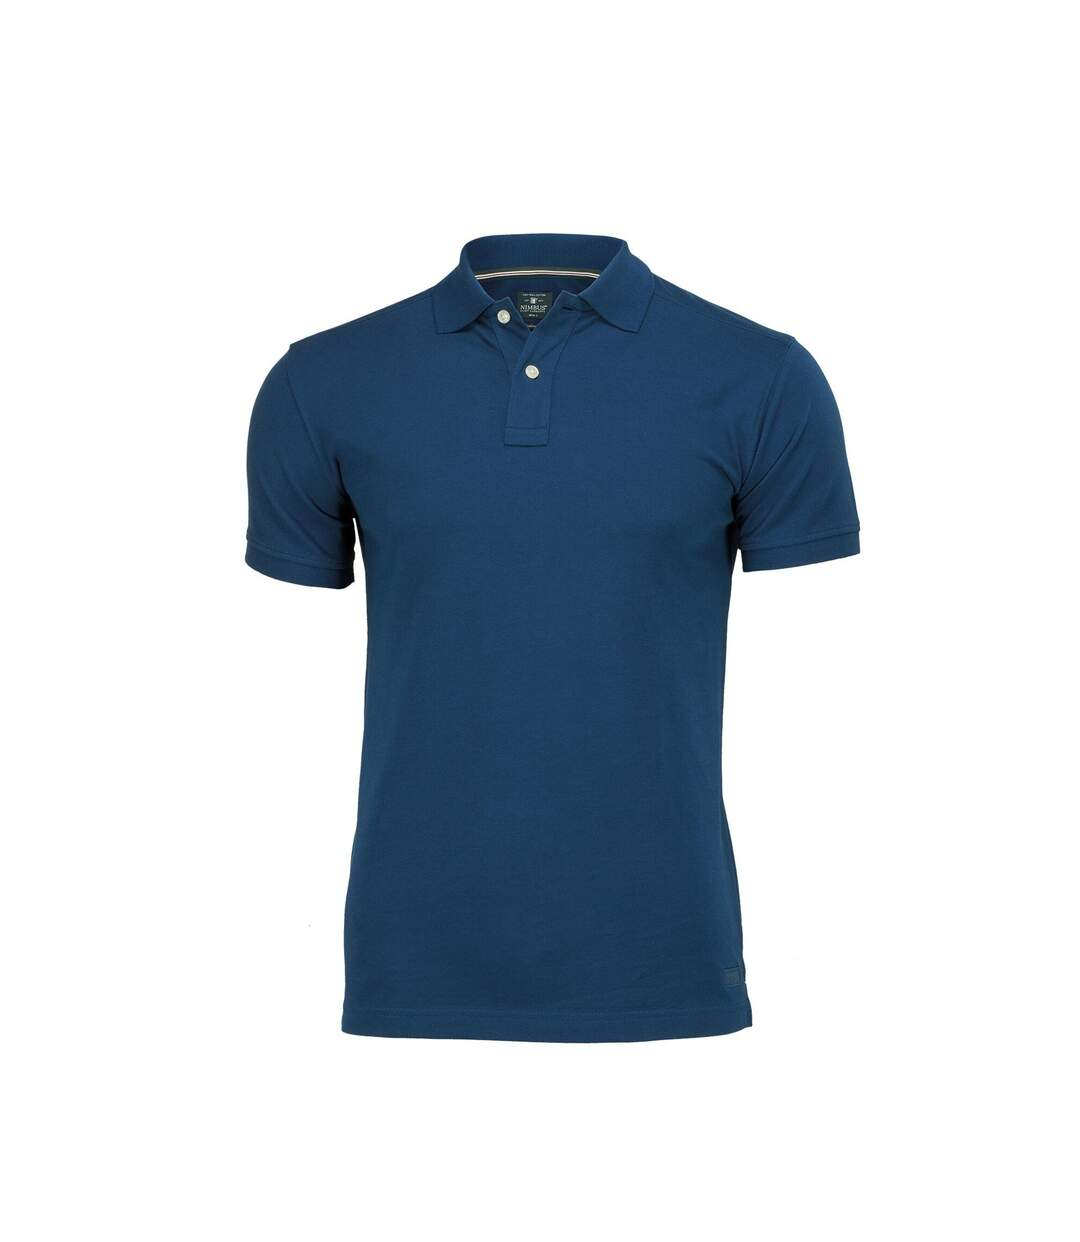 Nimbus Mens Yale Short Sleeve Polo Shirt (Red) - UTRW3619